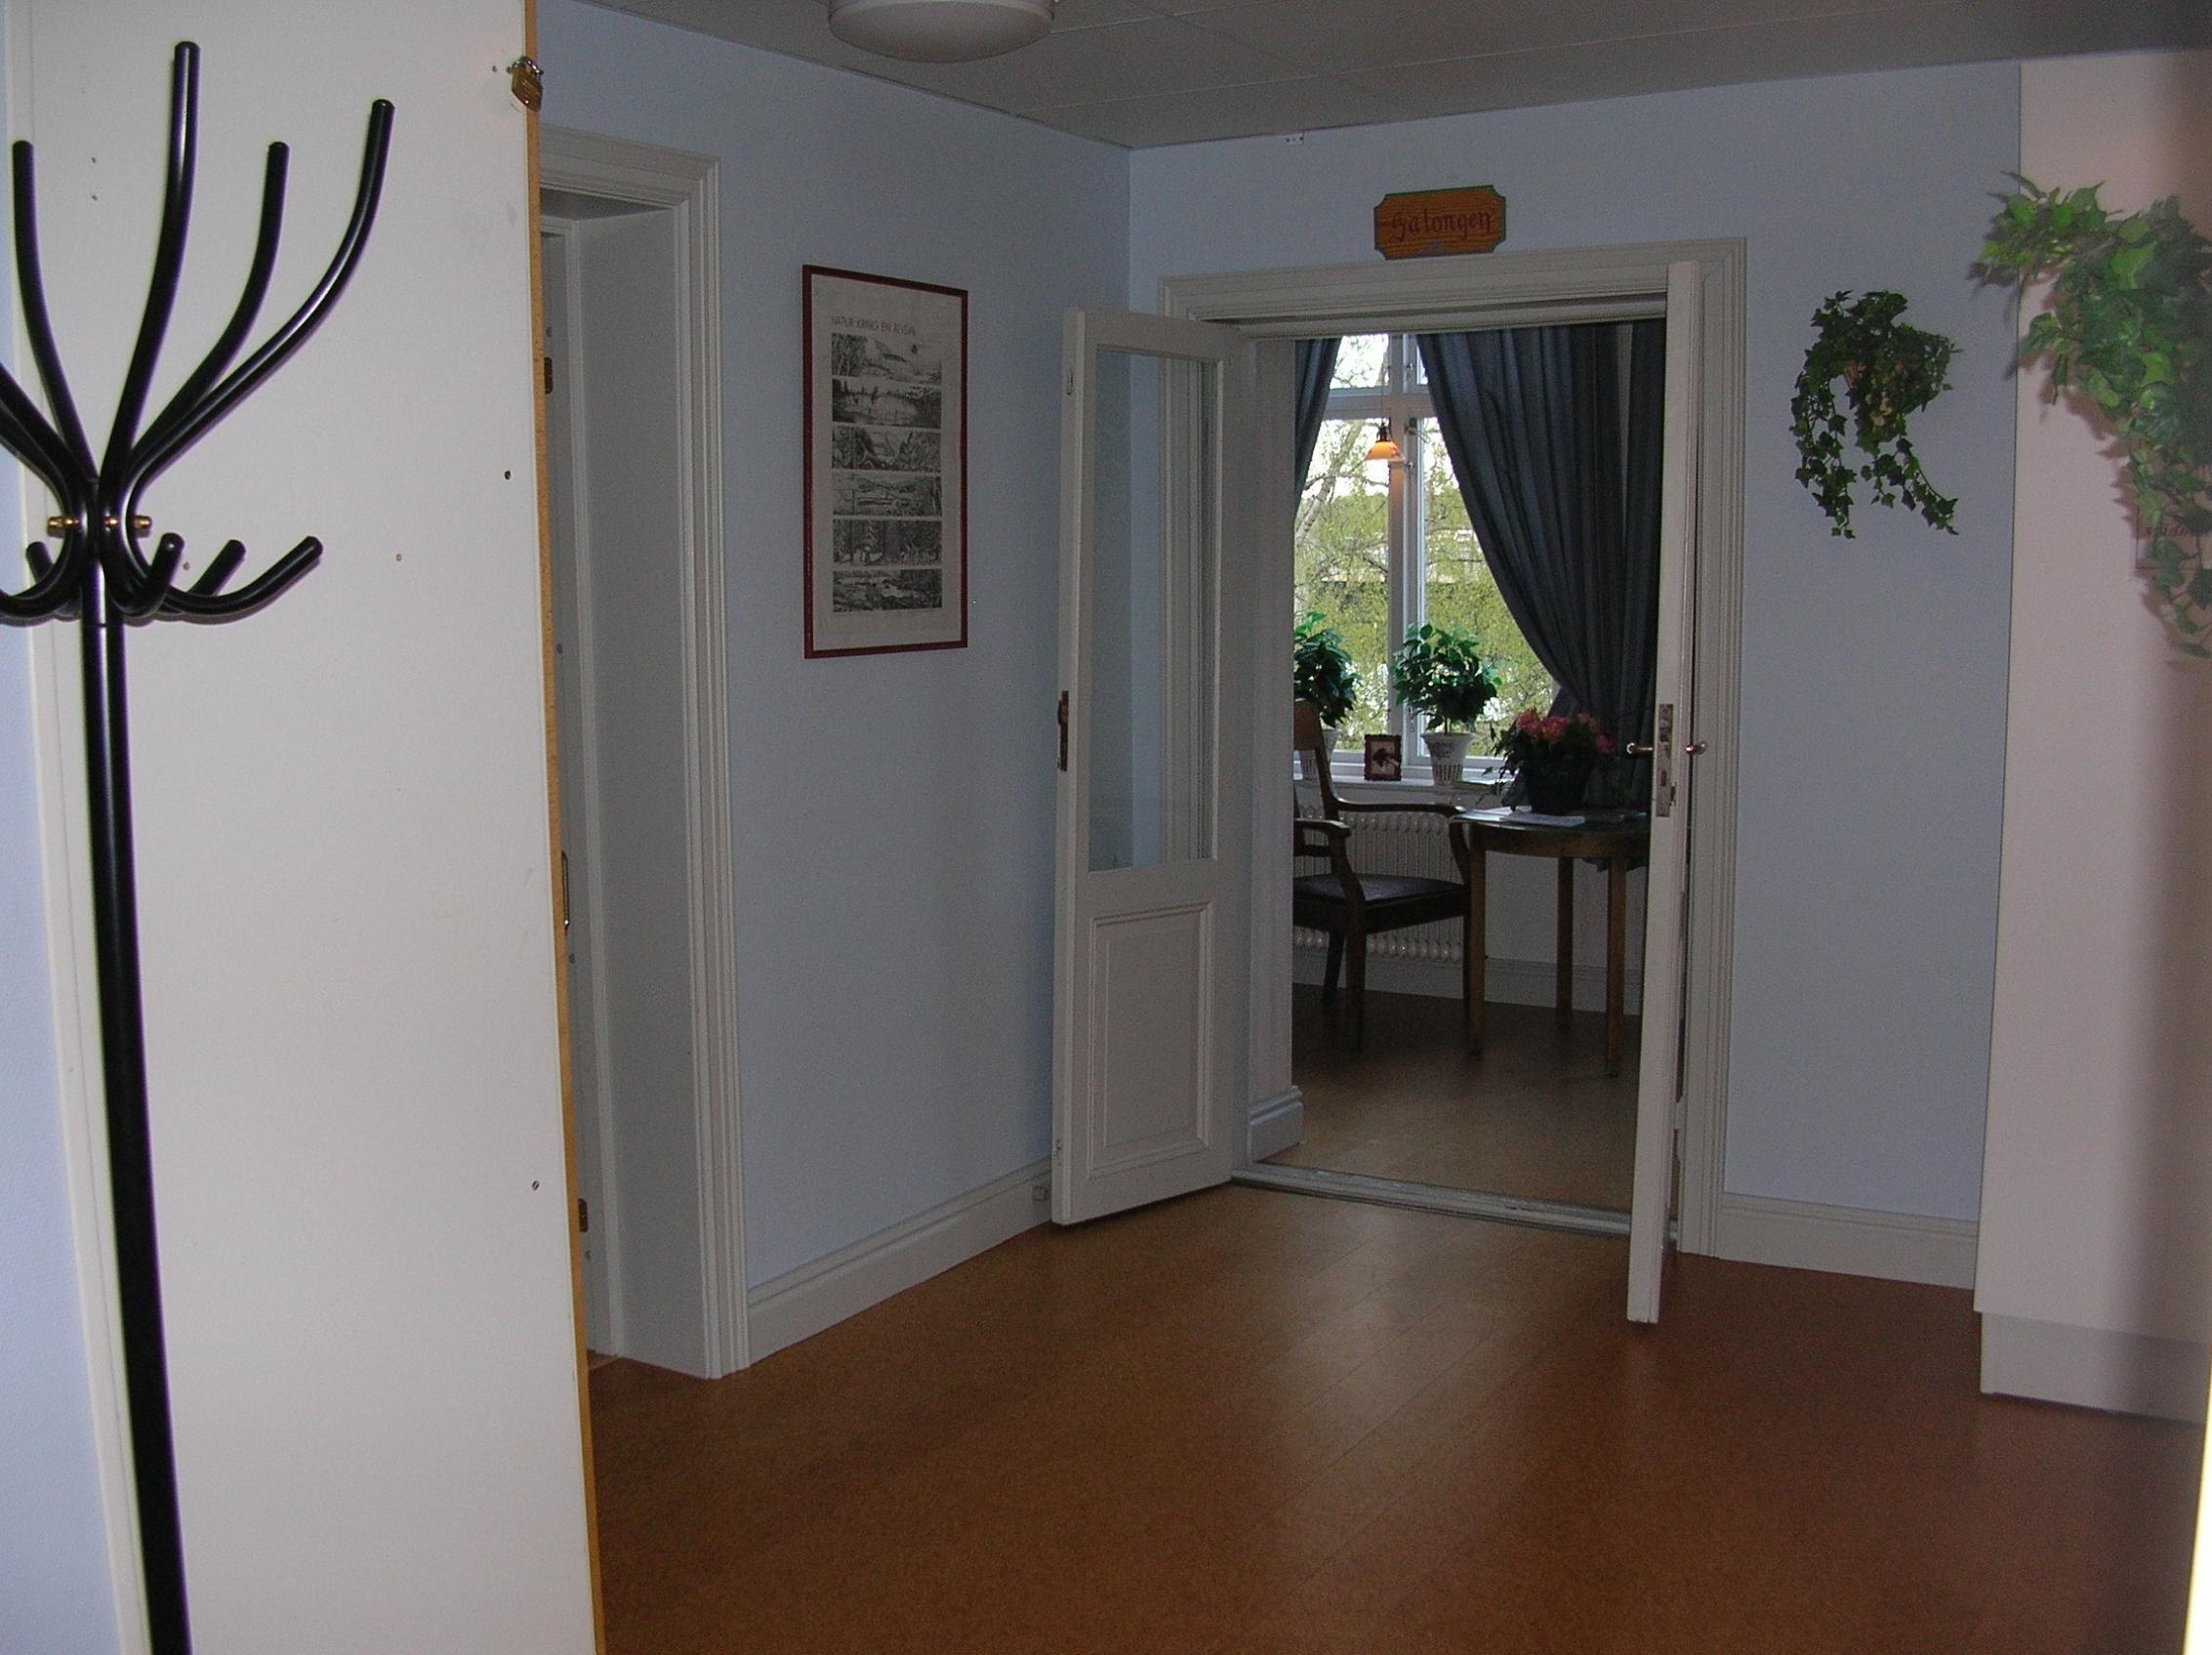 Strömsborg vandrarhem. Älvhuset